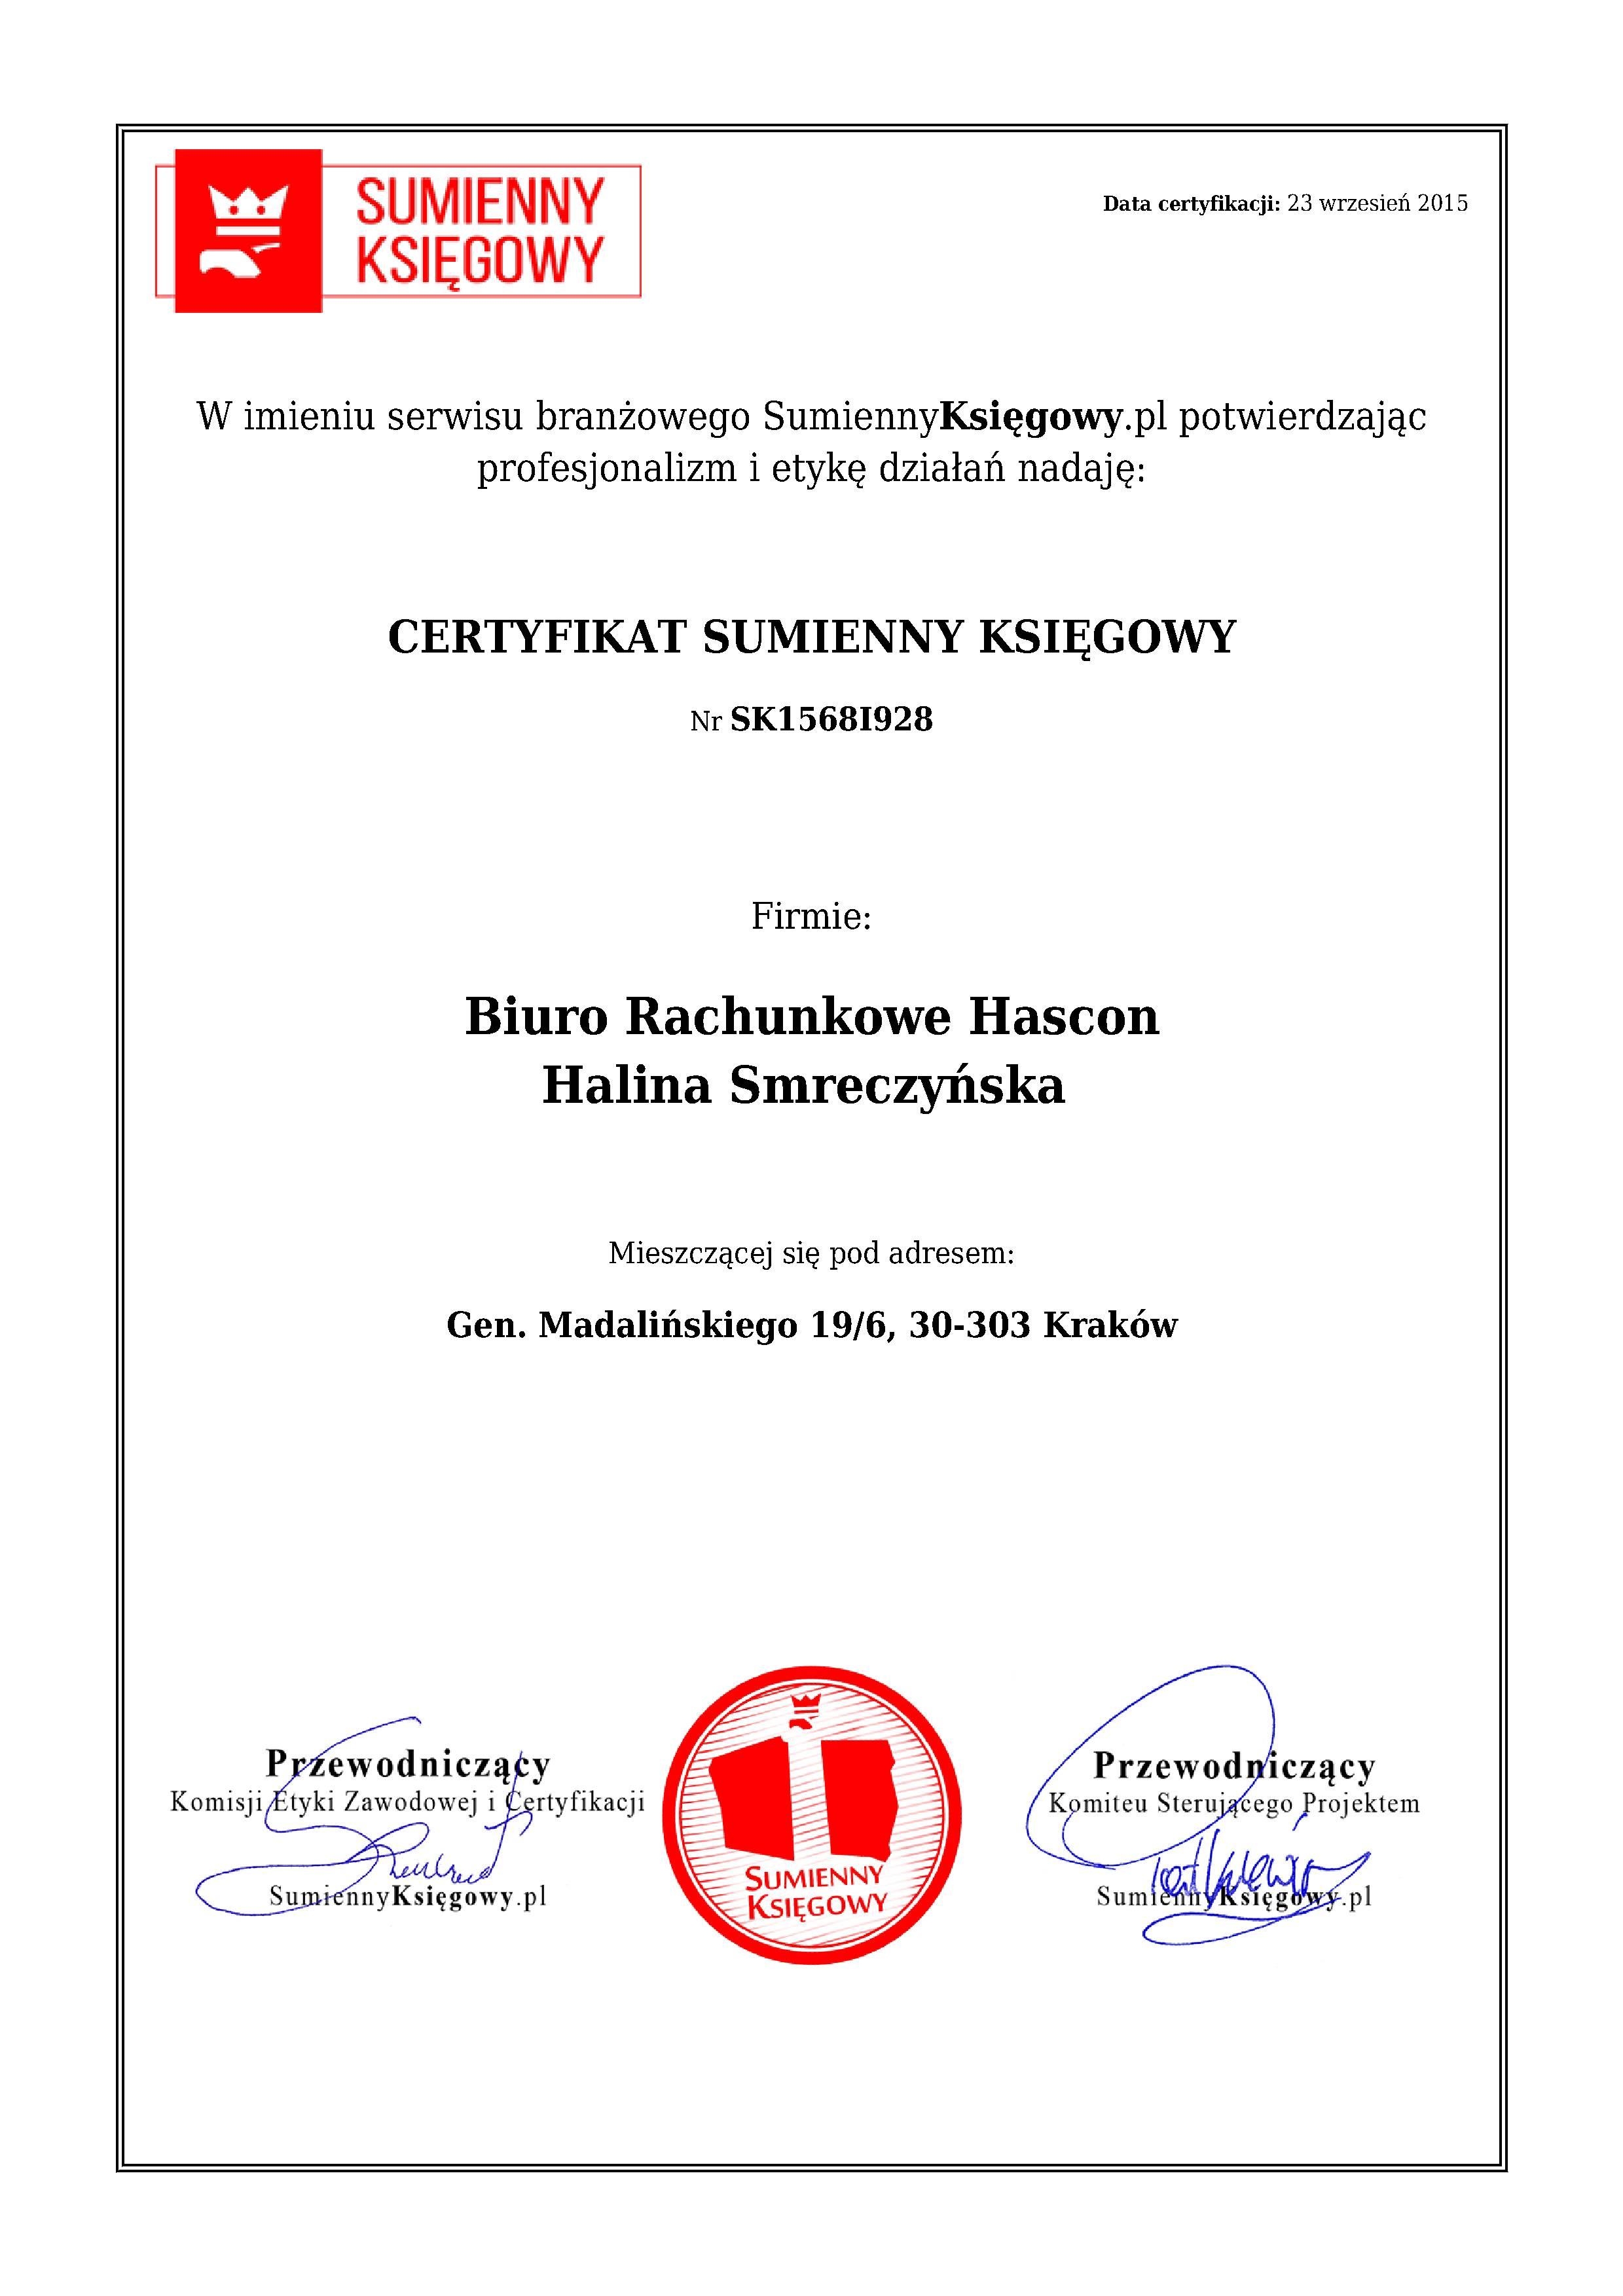 Certyfikat Biuro Rachunkowe Hascon Halina Smreczyńska